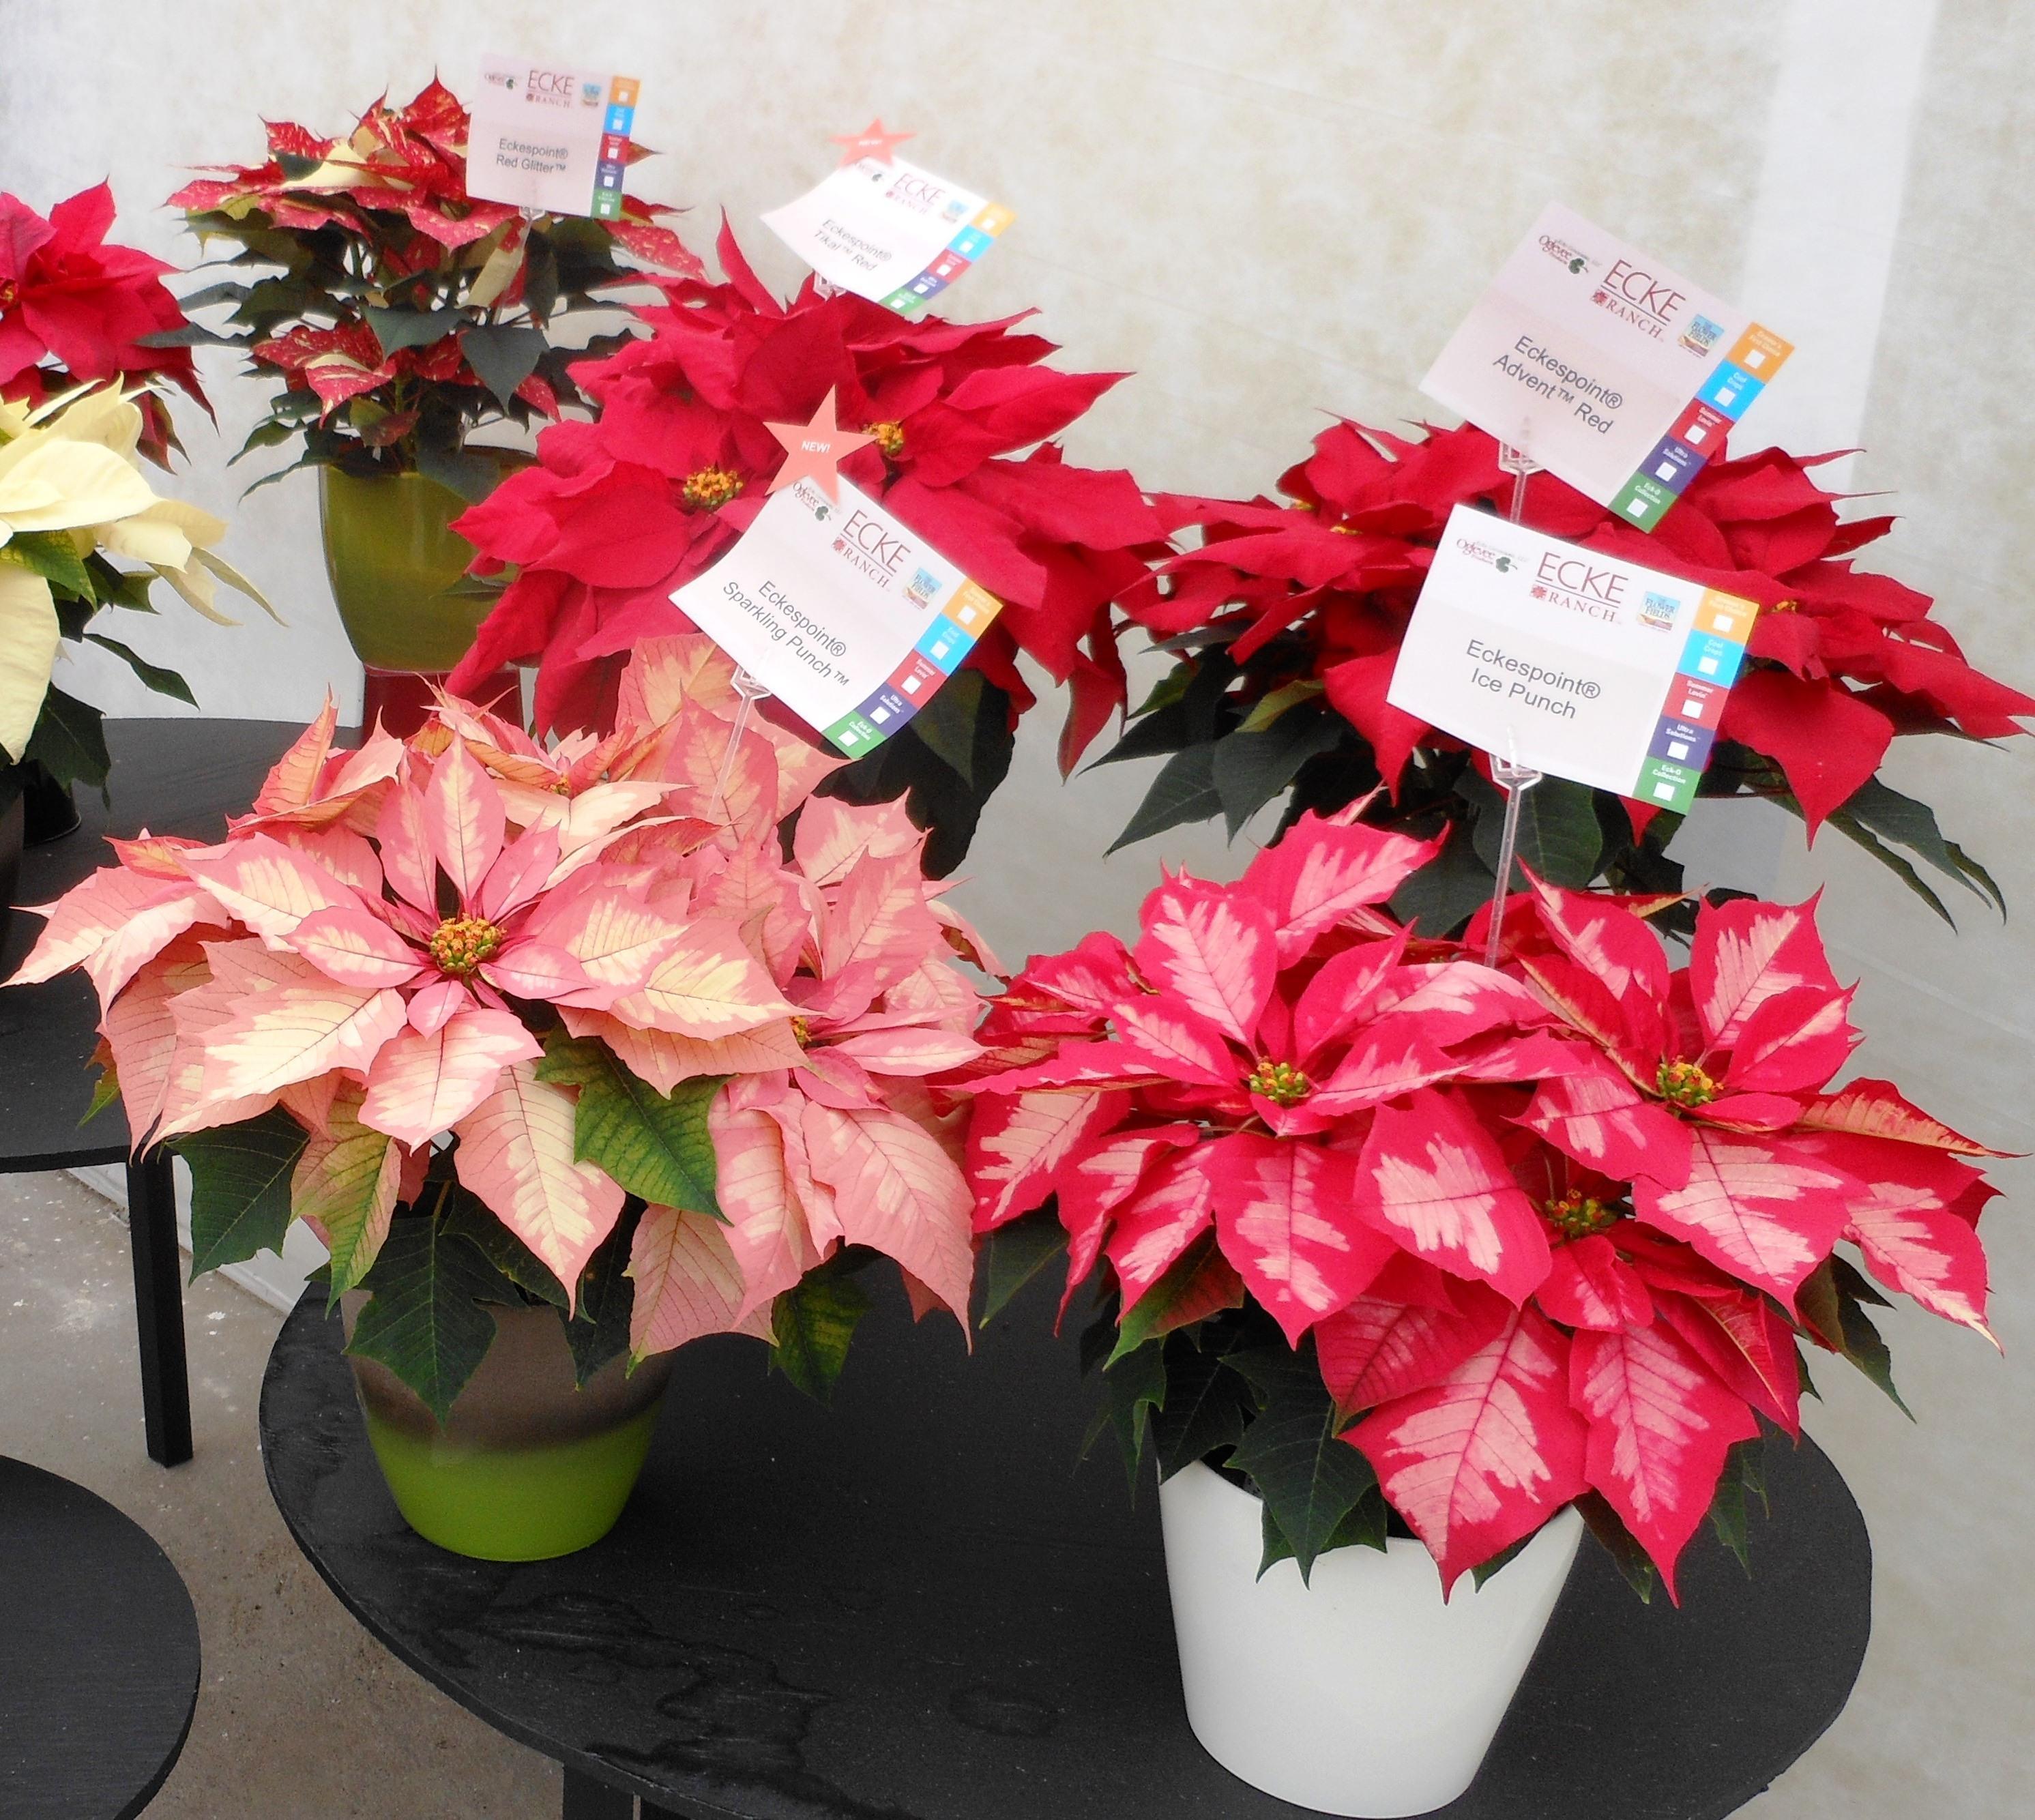 Proper Care Helps Poinsettias Thrive Through Holidays